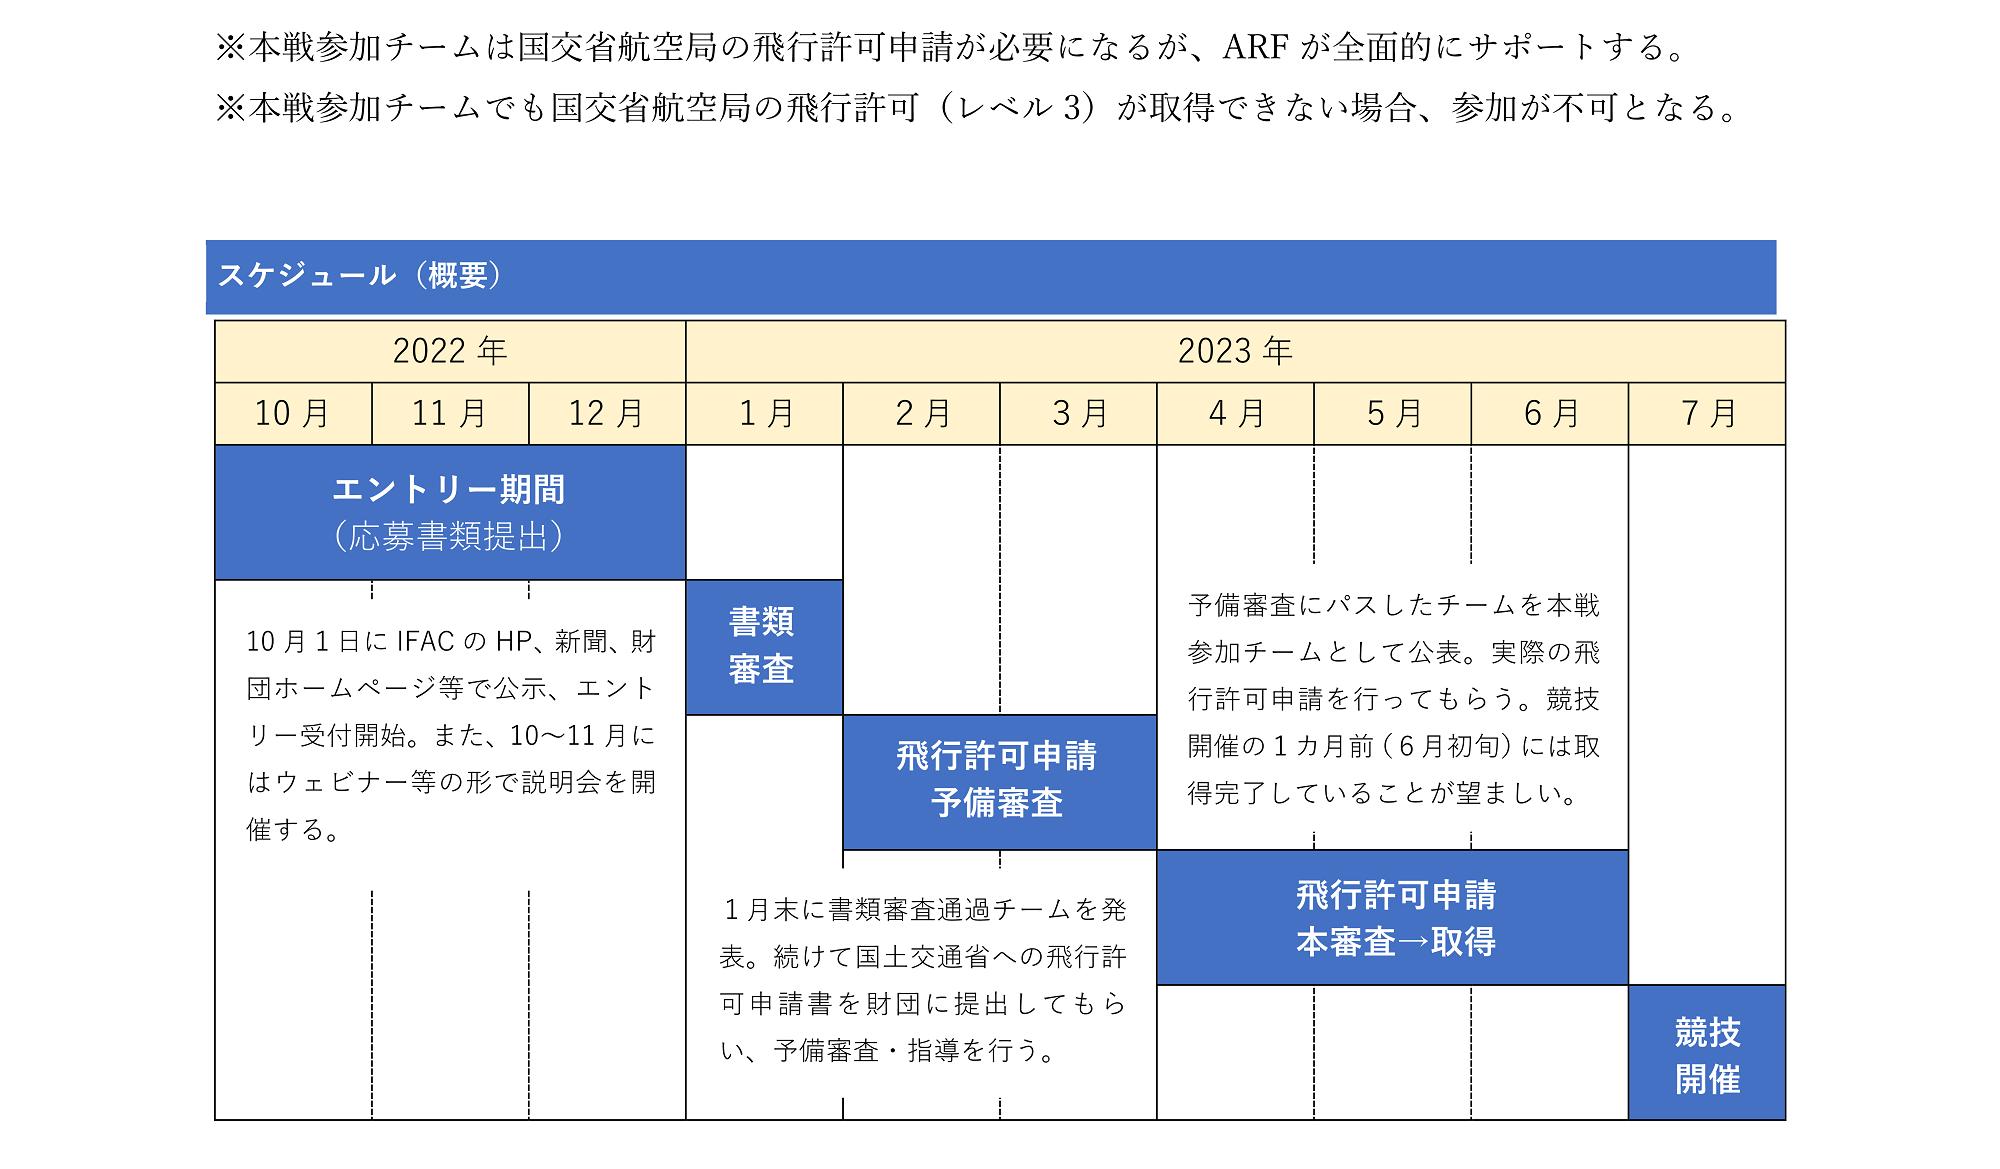 IFAC2023・ARF World Drone Competition(スケジュール)